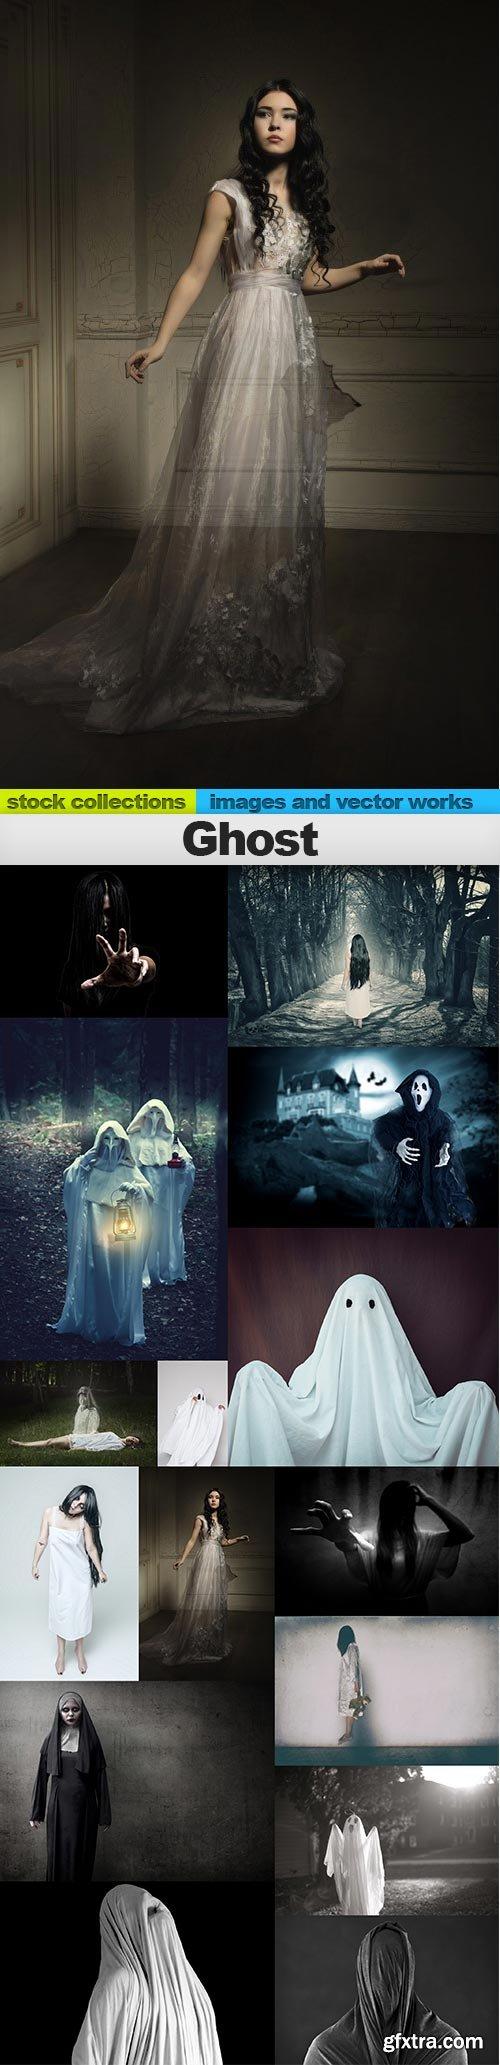 Ghost, 15 x UHQ JPEG